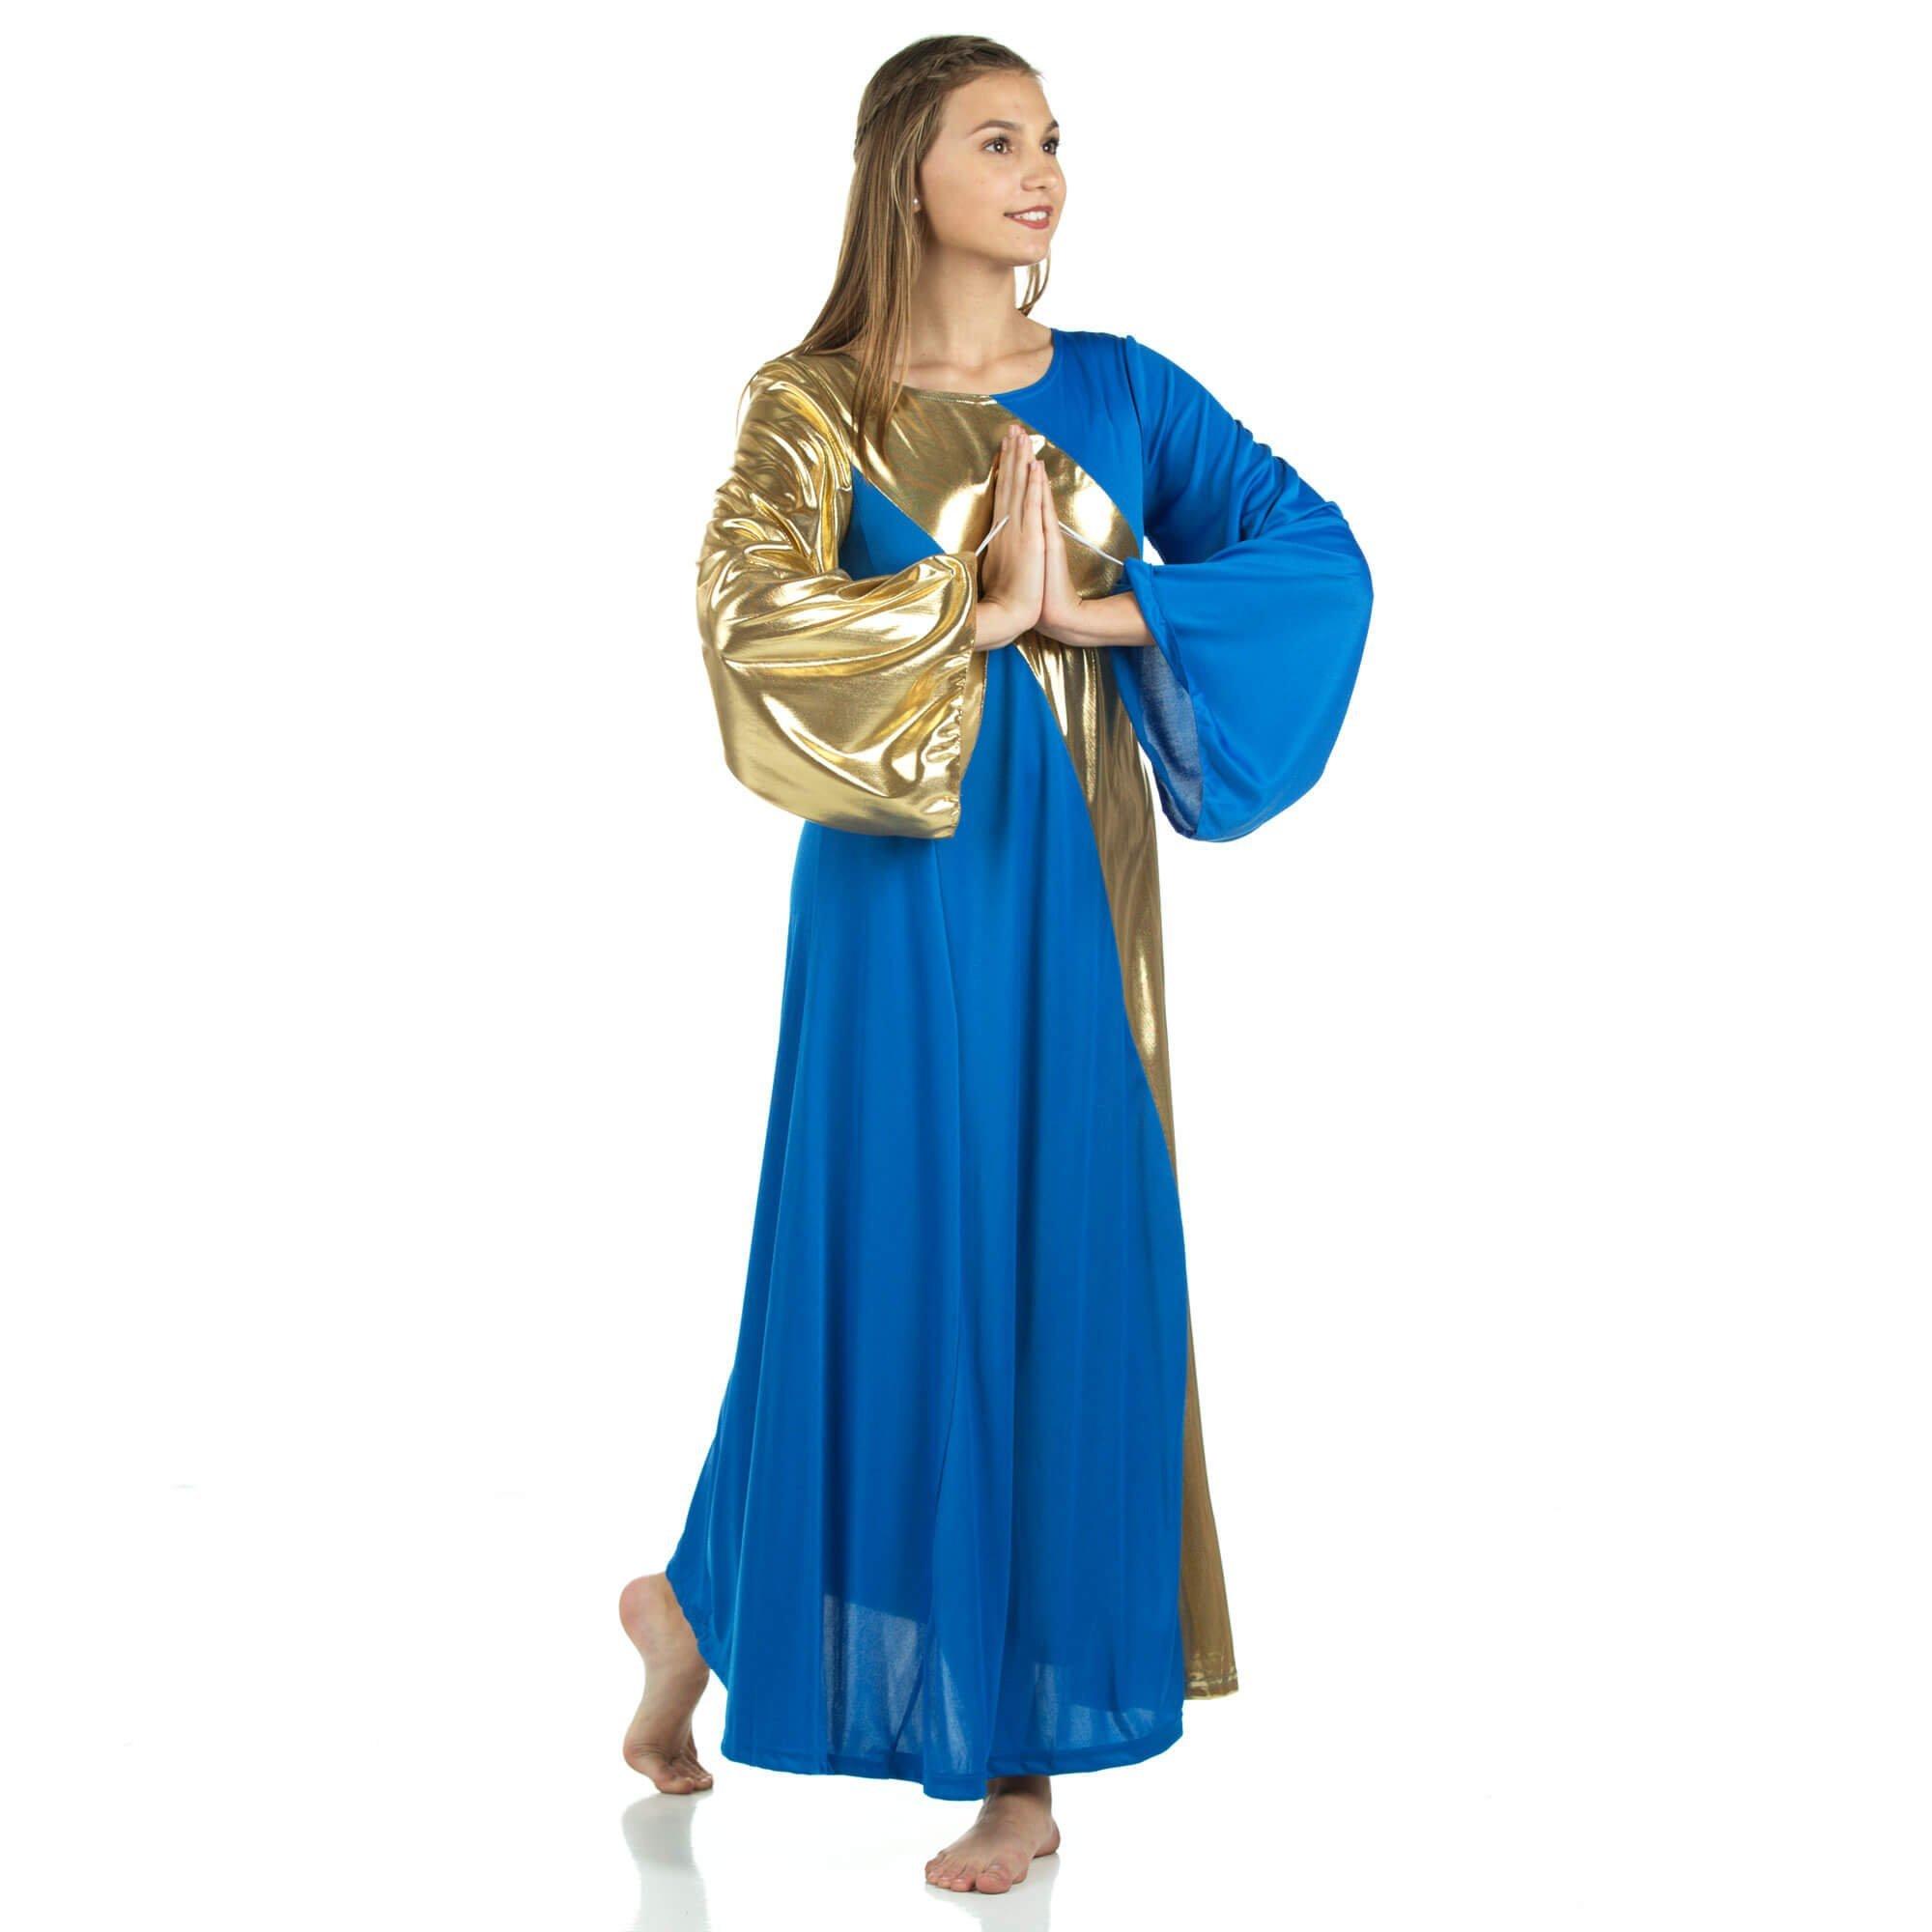 3f00f2e953cd Danzcue Womens Asymmetrical Bell Sleeve Dance Dress, Bright Royal-Gold, M